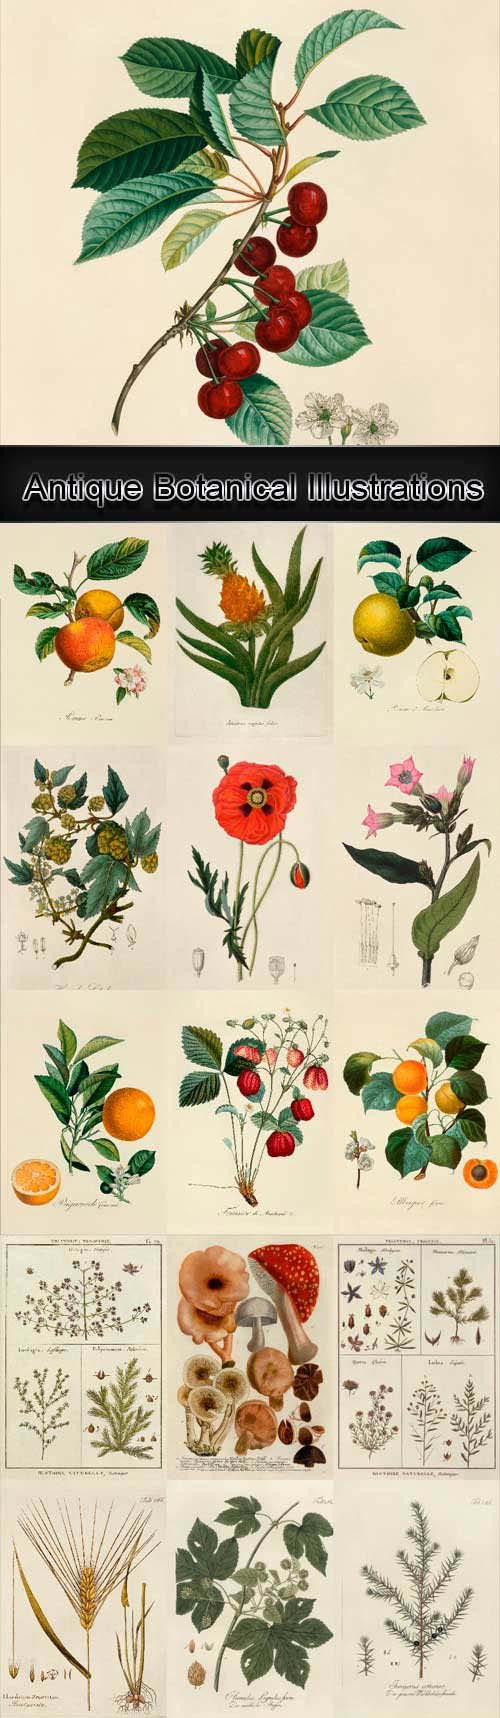 Antique Botanical Illustrations 1640-1900